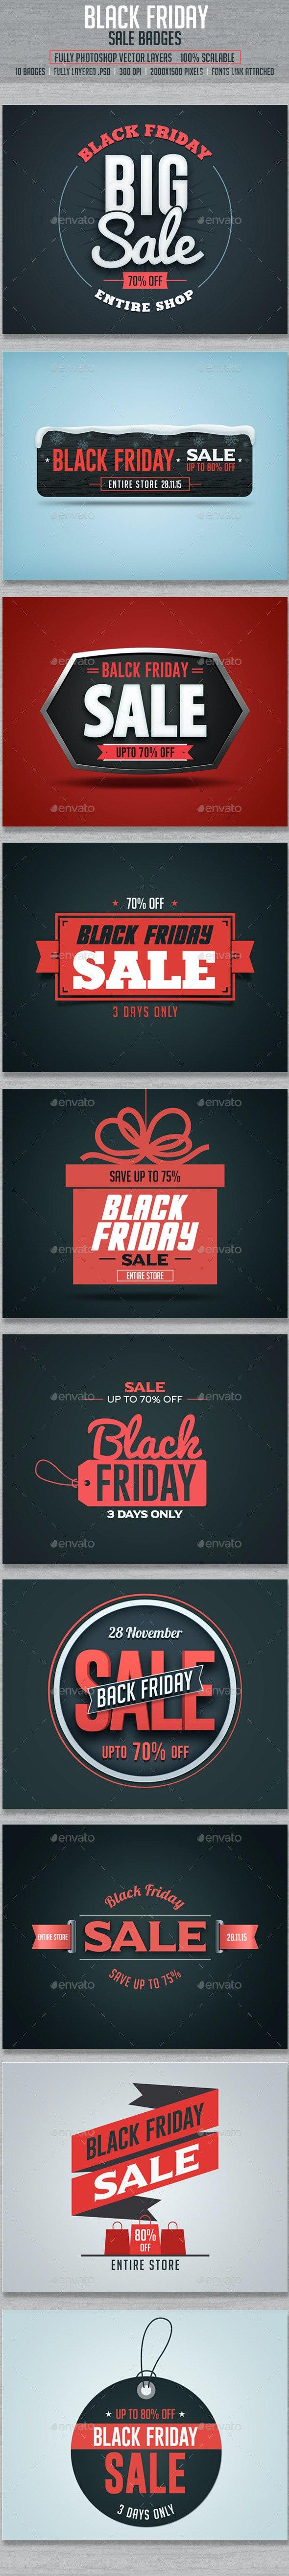 Black Friday Sale Badges - Badges & Stickers Web Elements